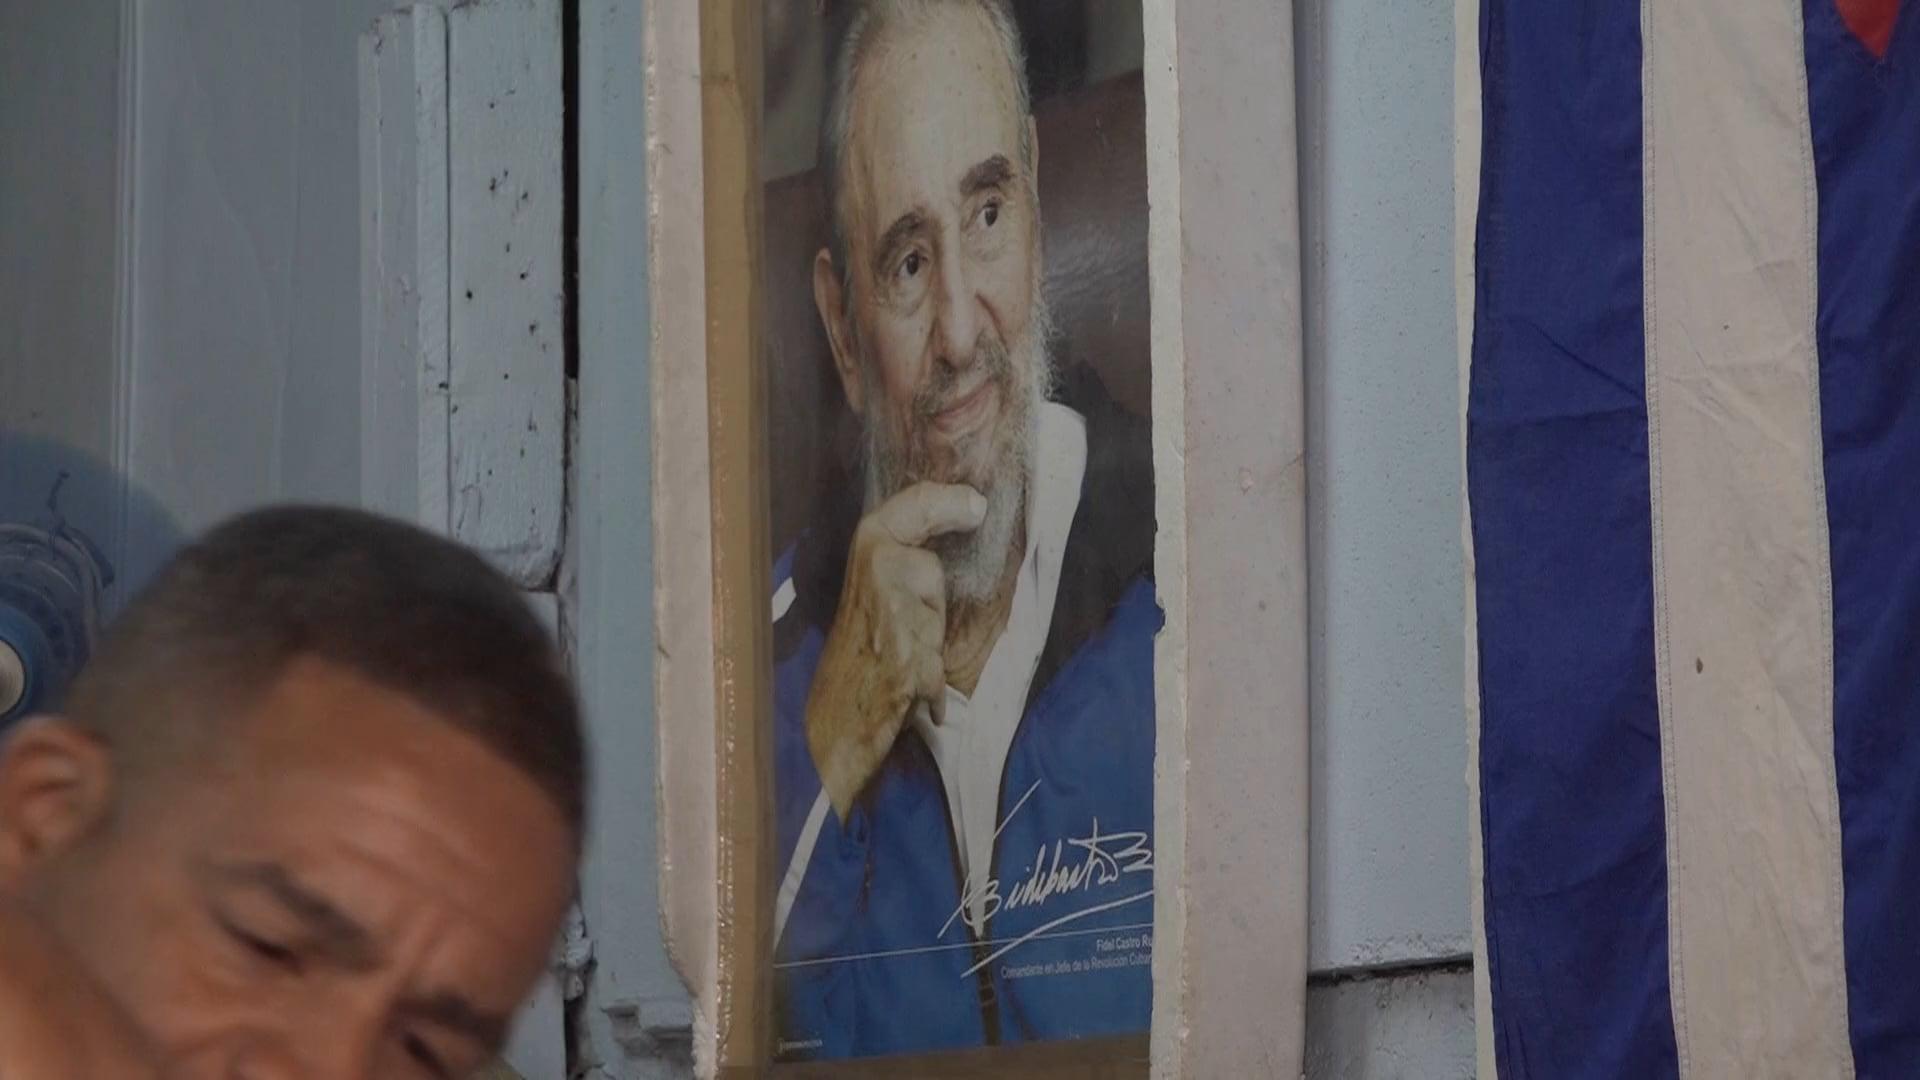 State of the economy in Cuba - TRT - FSN